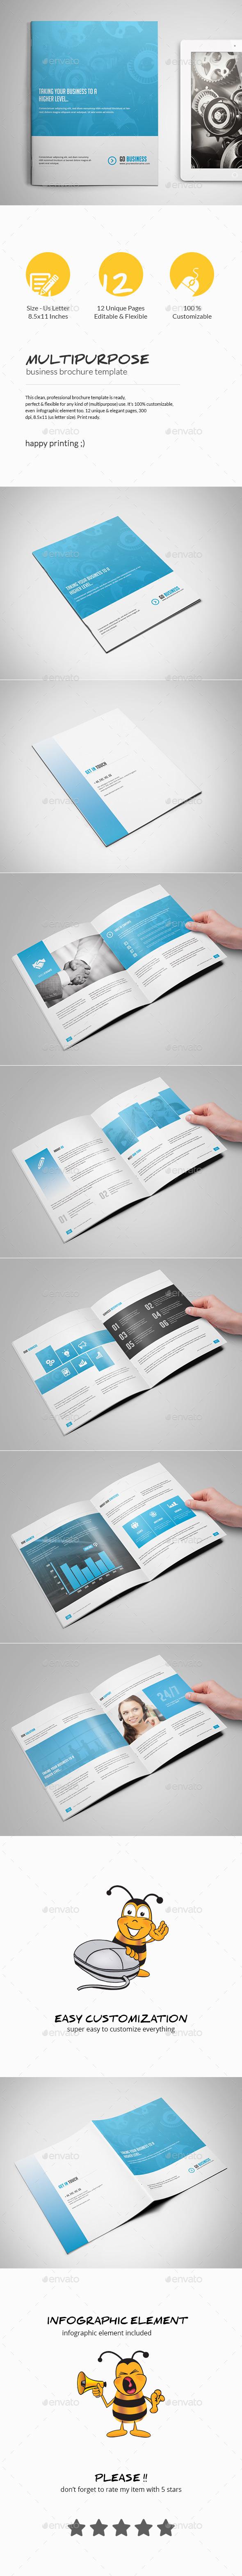 GraphicRiver Multipurpose Business Brochure Template 10721375